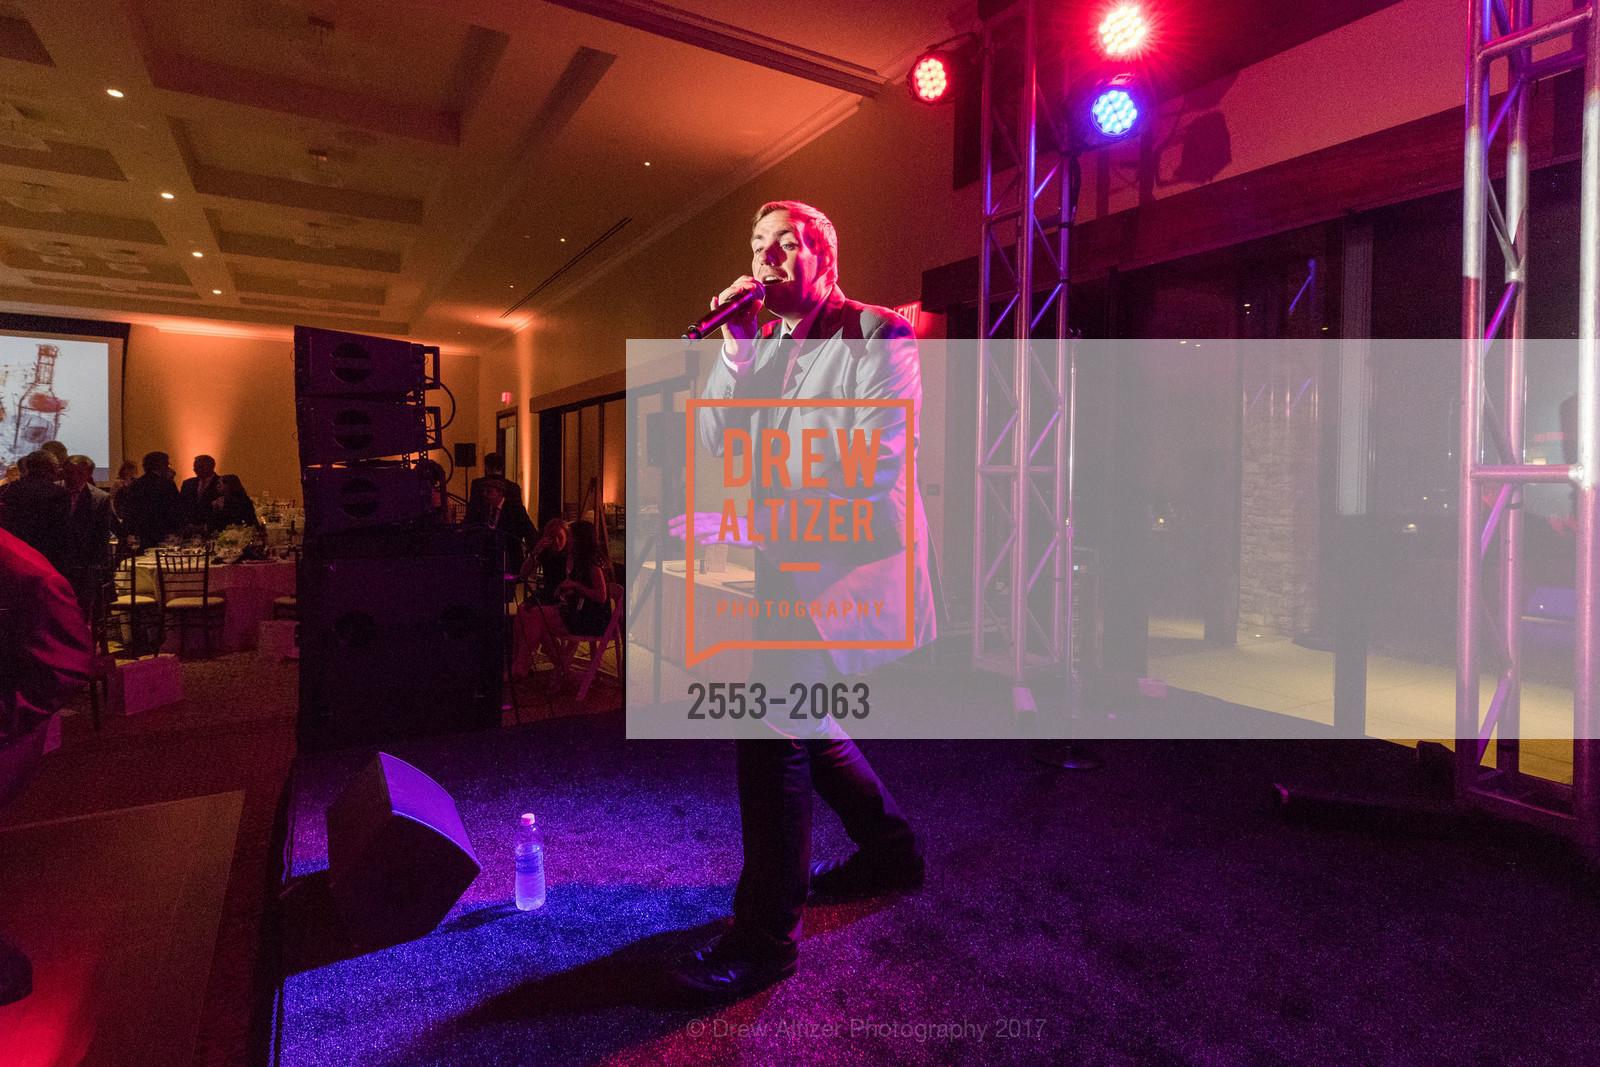 Performance, Photo #2553-2063